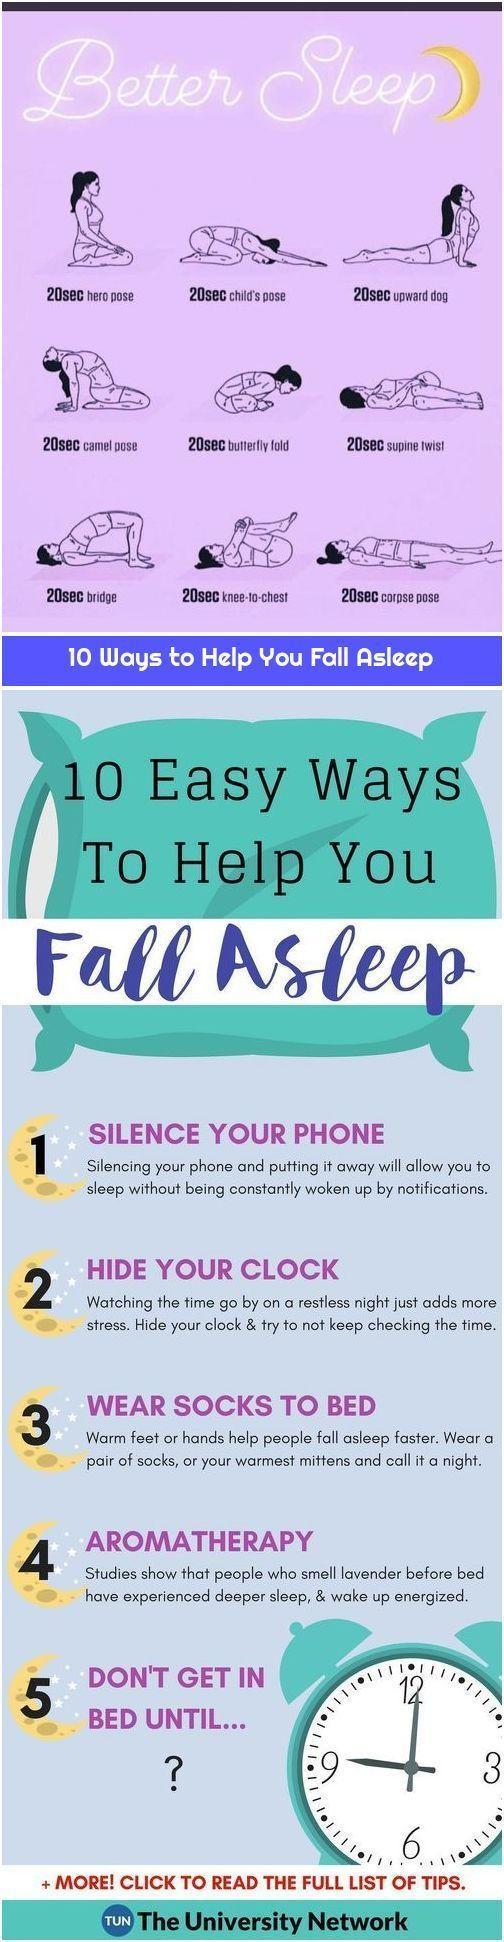 1. Yoga Snooze 10 Ways to Help You Fall Asleep Have trouble falling asleep? Here are some simple ways to help you go to sleep on those restless nights 2. 10 Ways to Help You Fall Asleep Yoga Snooze Yoga poses to lull you to sleep. #beautysleep #yogaposes #yogalifestyle #sleeptherapy -#Asleep, #Fall, #SleepHacks, #Snooze, #Ways, #Yoga